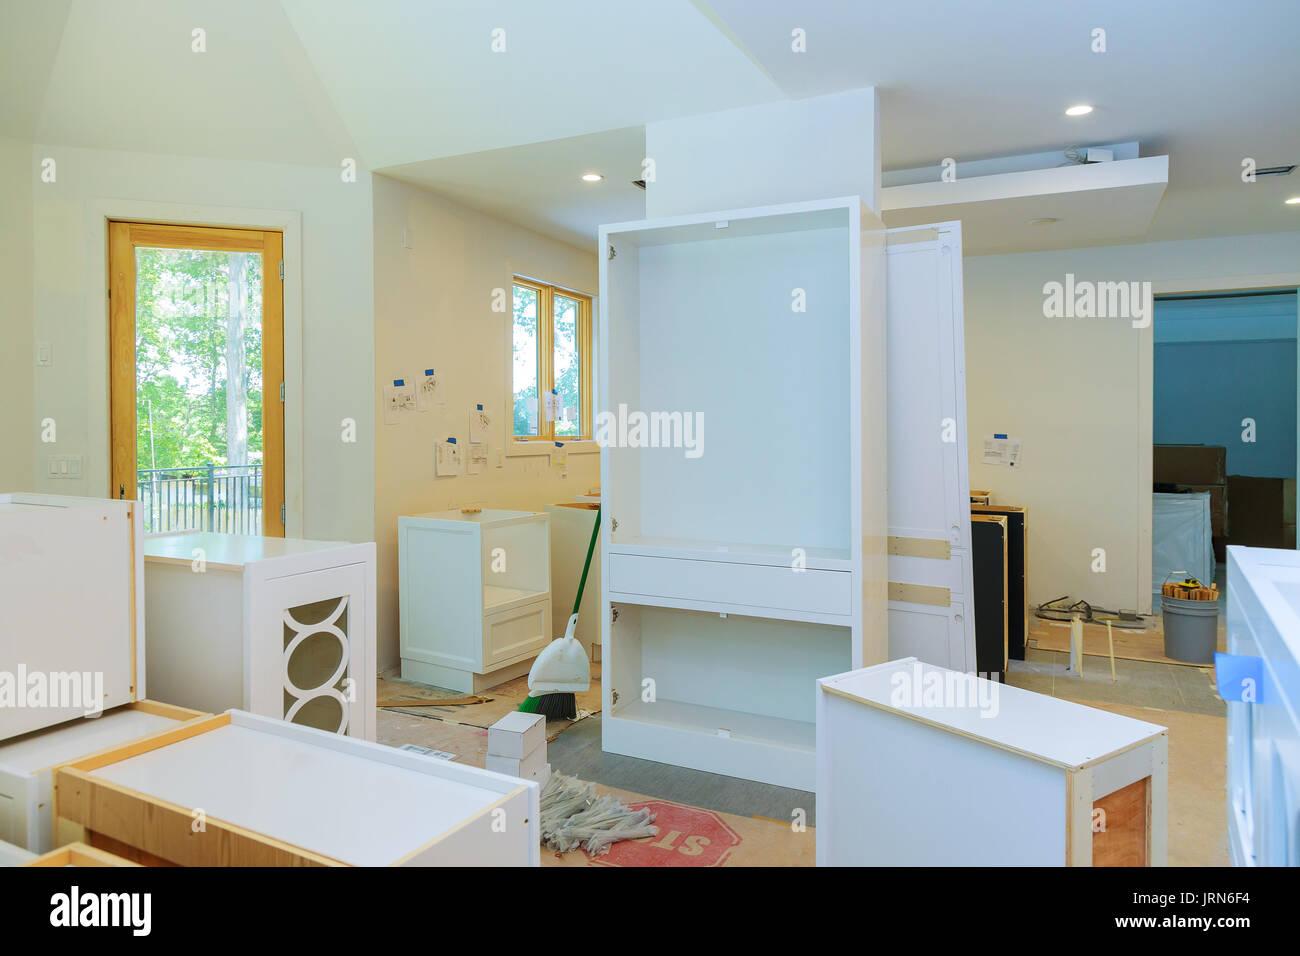 Custom Cabinet Stock Photos & Custom Cabinet Stock Images - Alamy